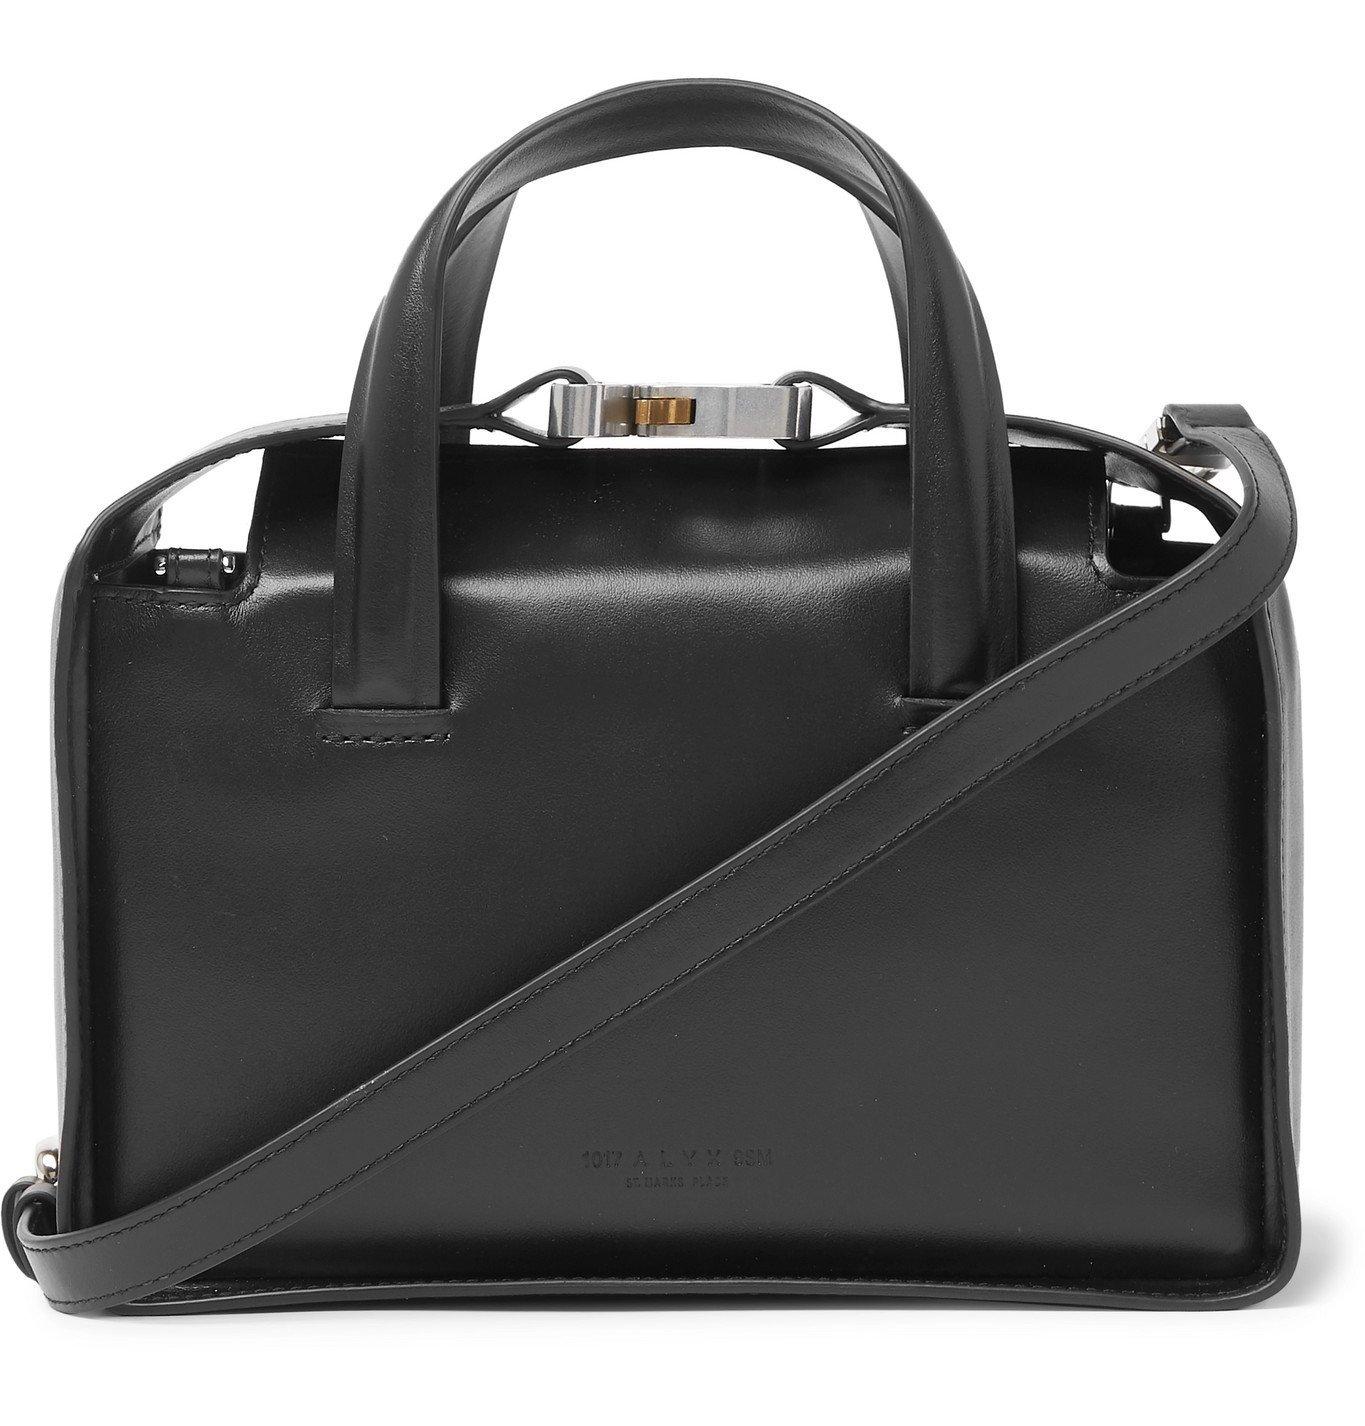 1017 ALYX 9SM - Brie Leather Messenger Bag - Black